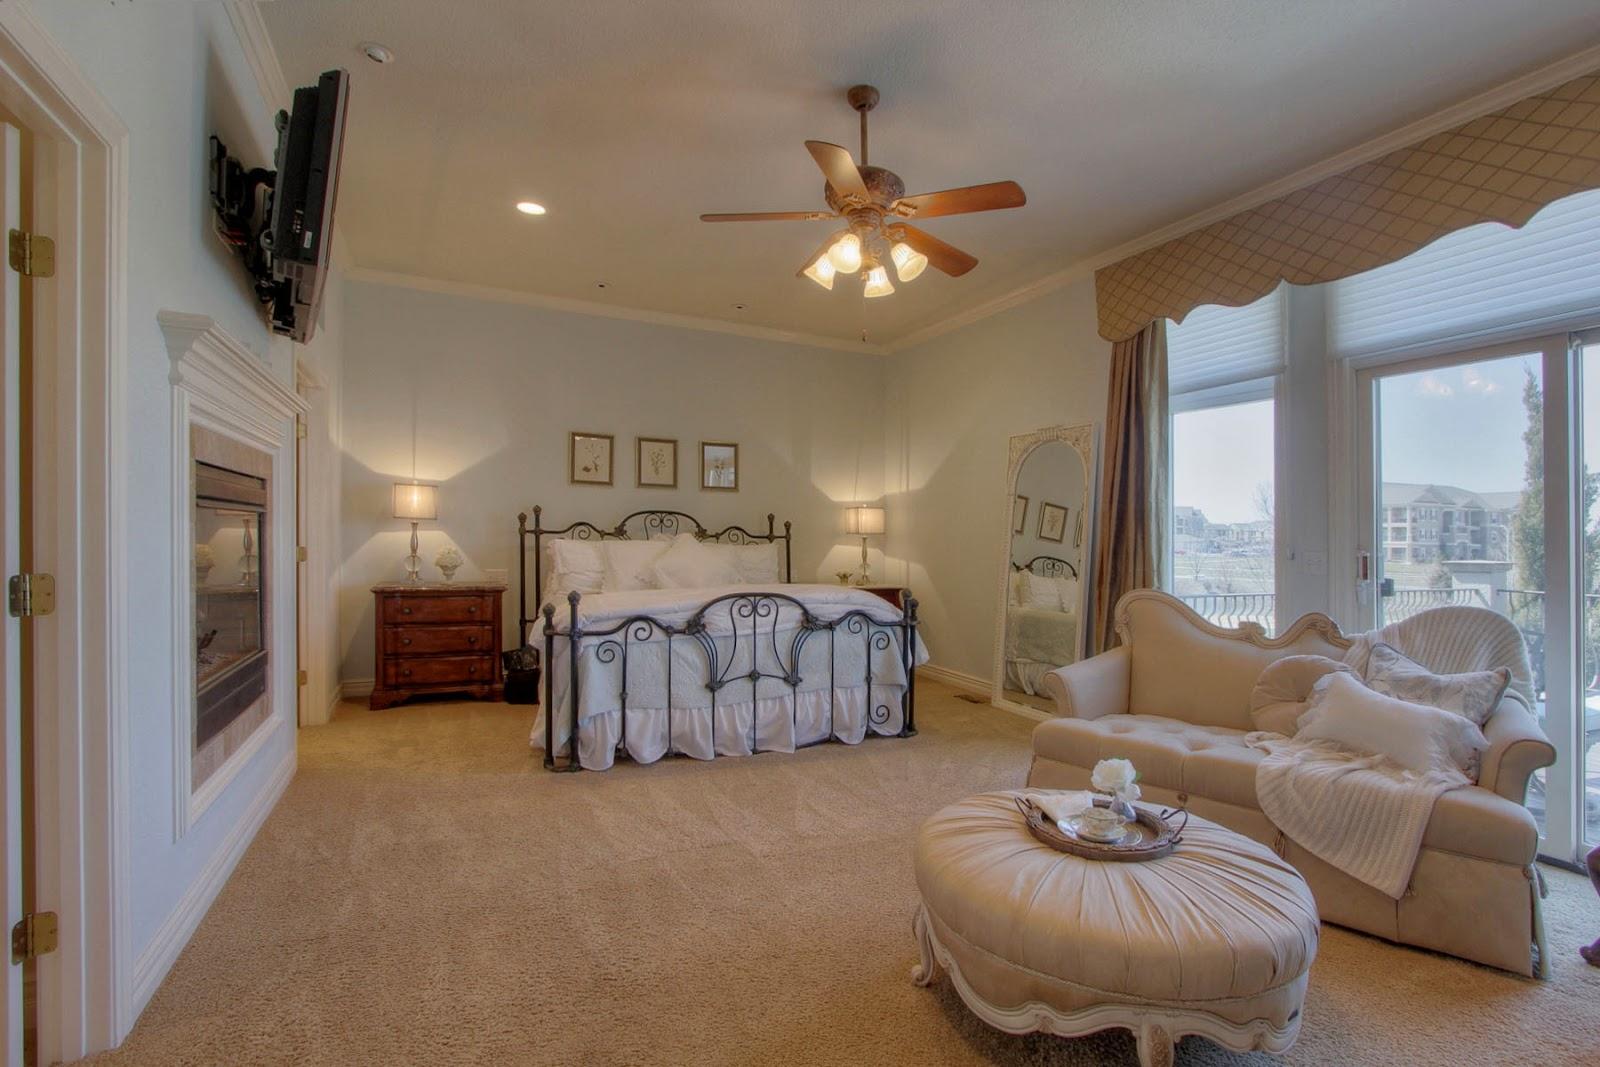 beaux r'eves hardwood floors in the master bedroomstep